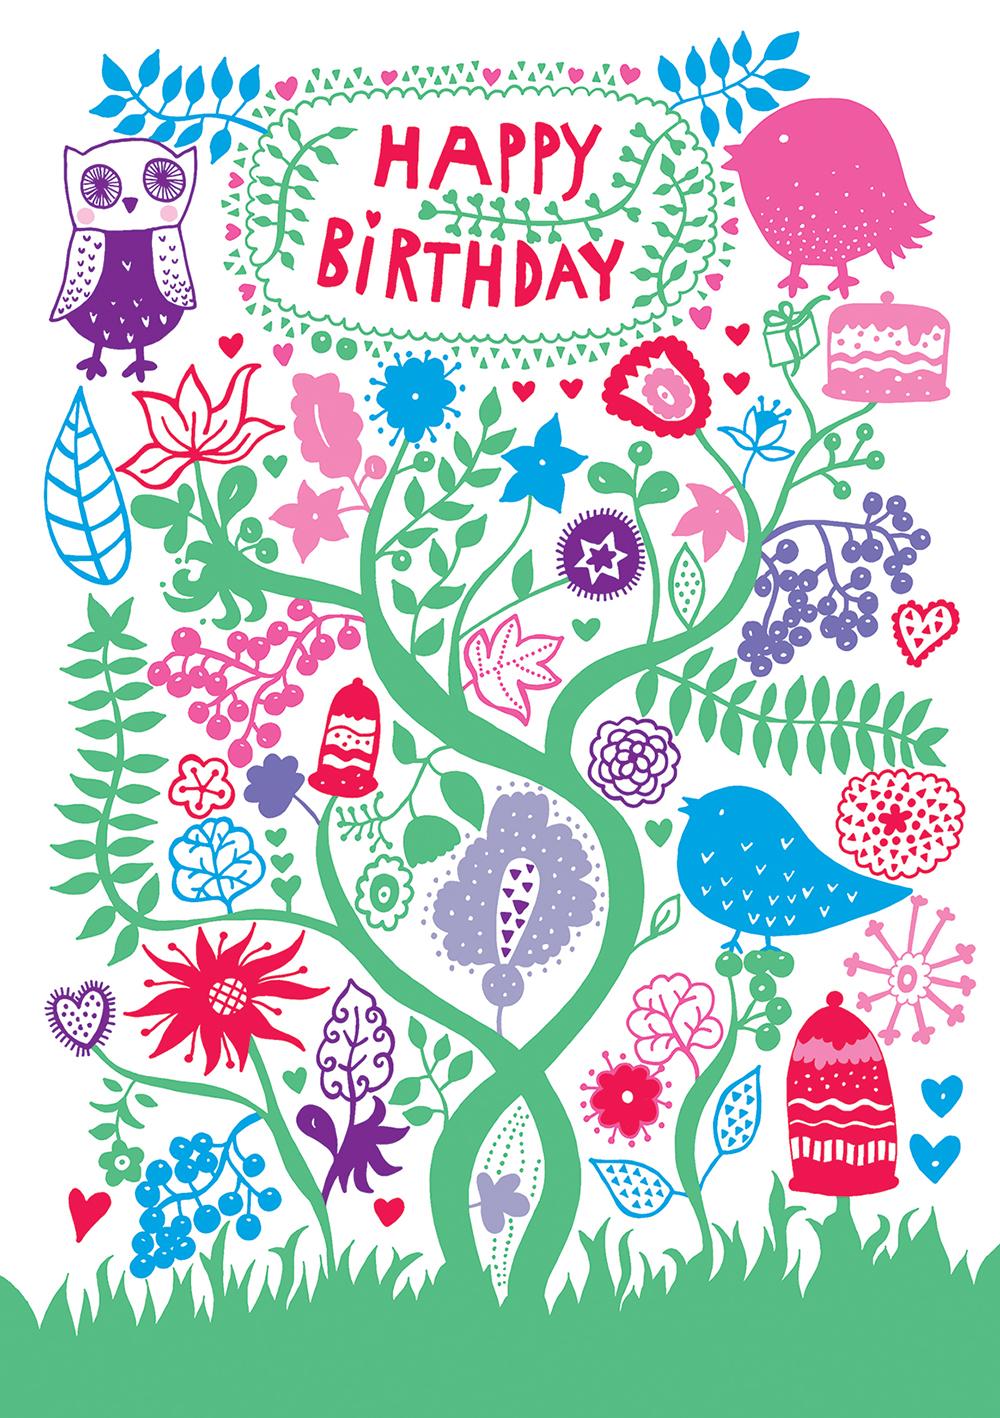 Marenthe Roger La Borde Happy Birthday.jpg